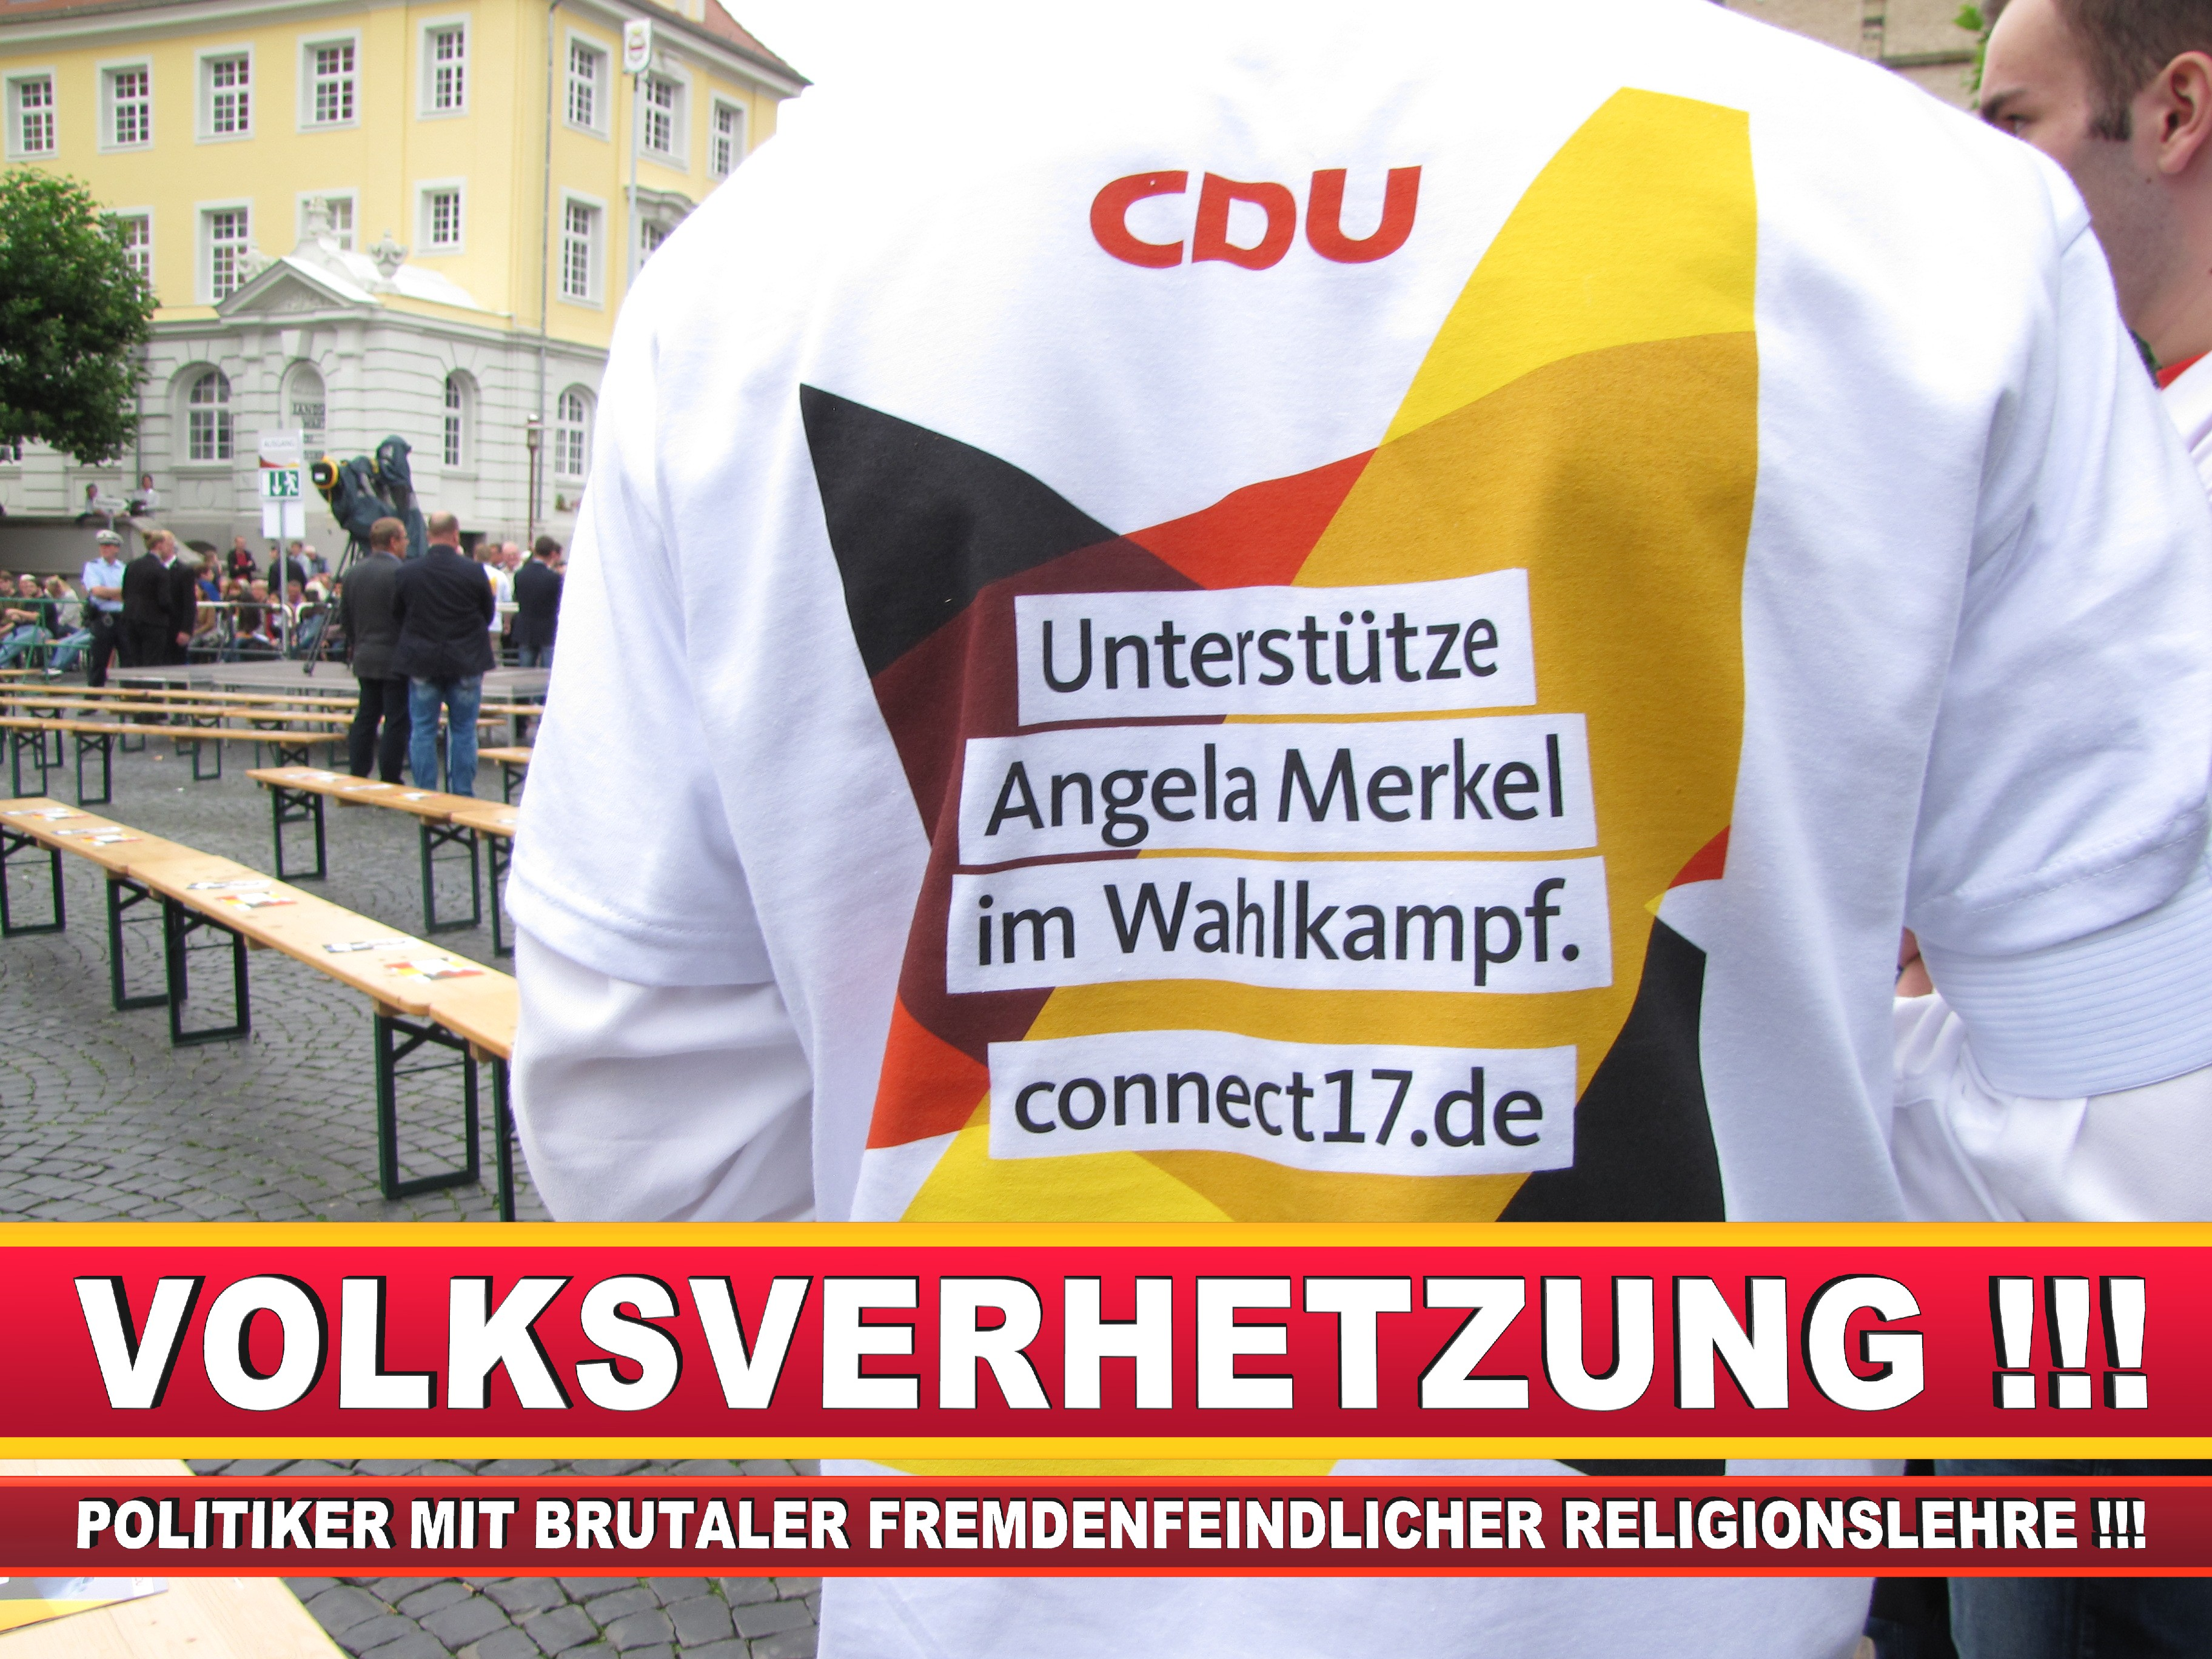 CDU HERFORD Kurruption Betrug Kinderpornografie Kinderpornos (14)